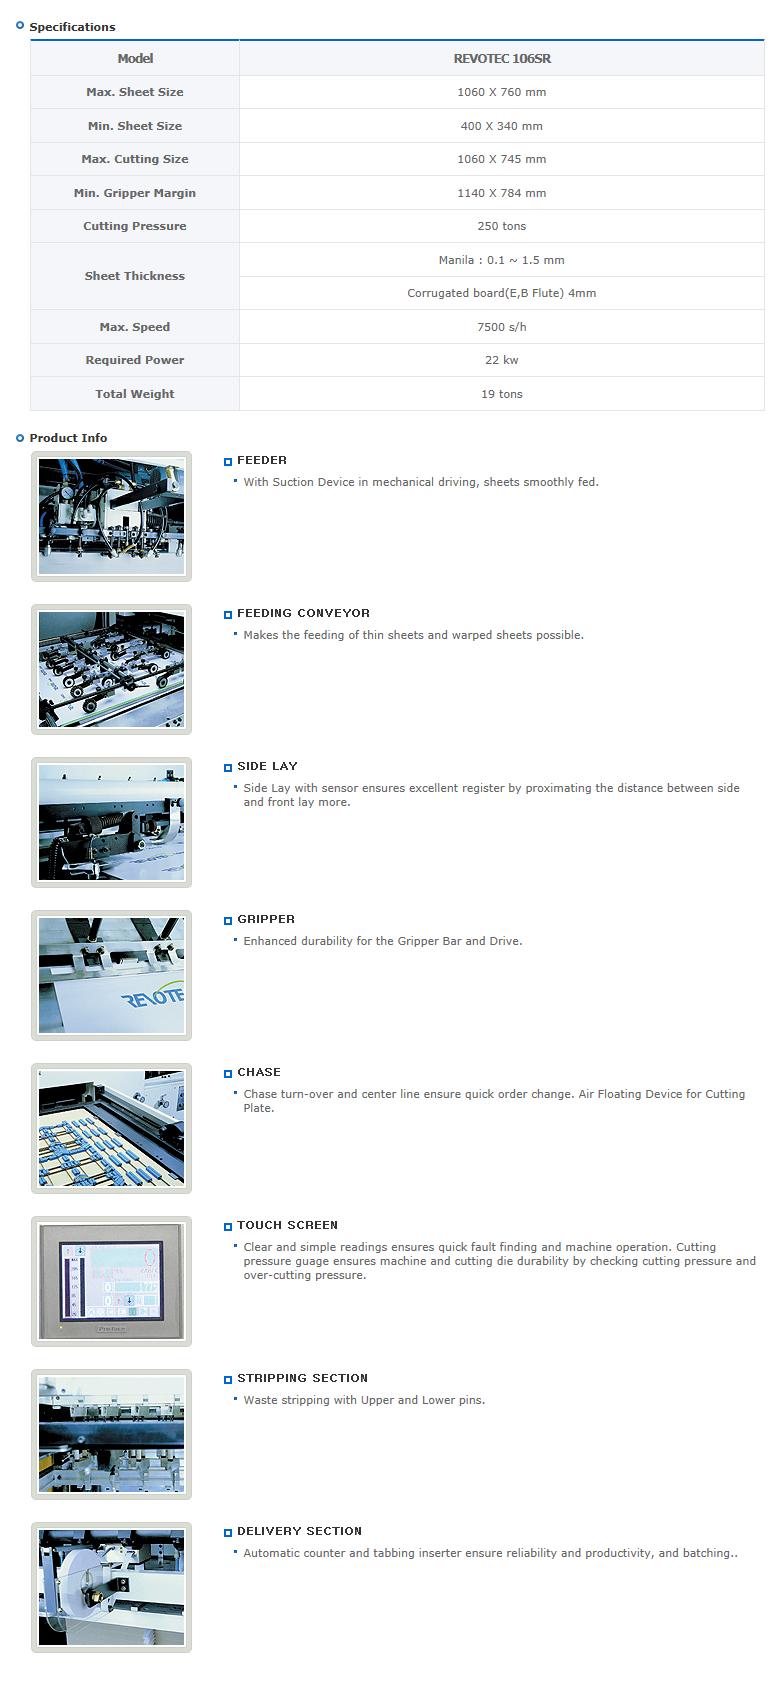 Yougnshin Machinery  REVOTEC 106SR